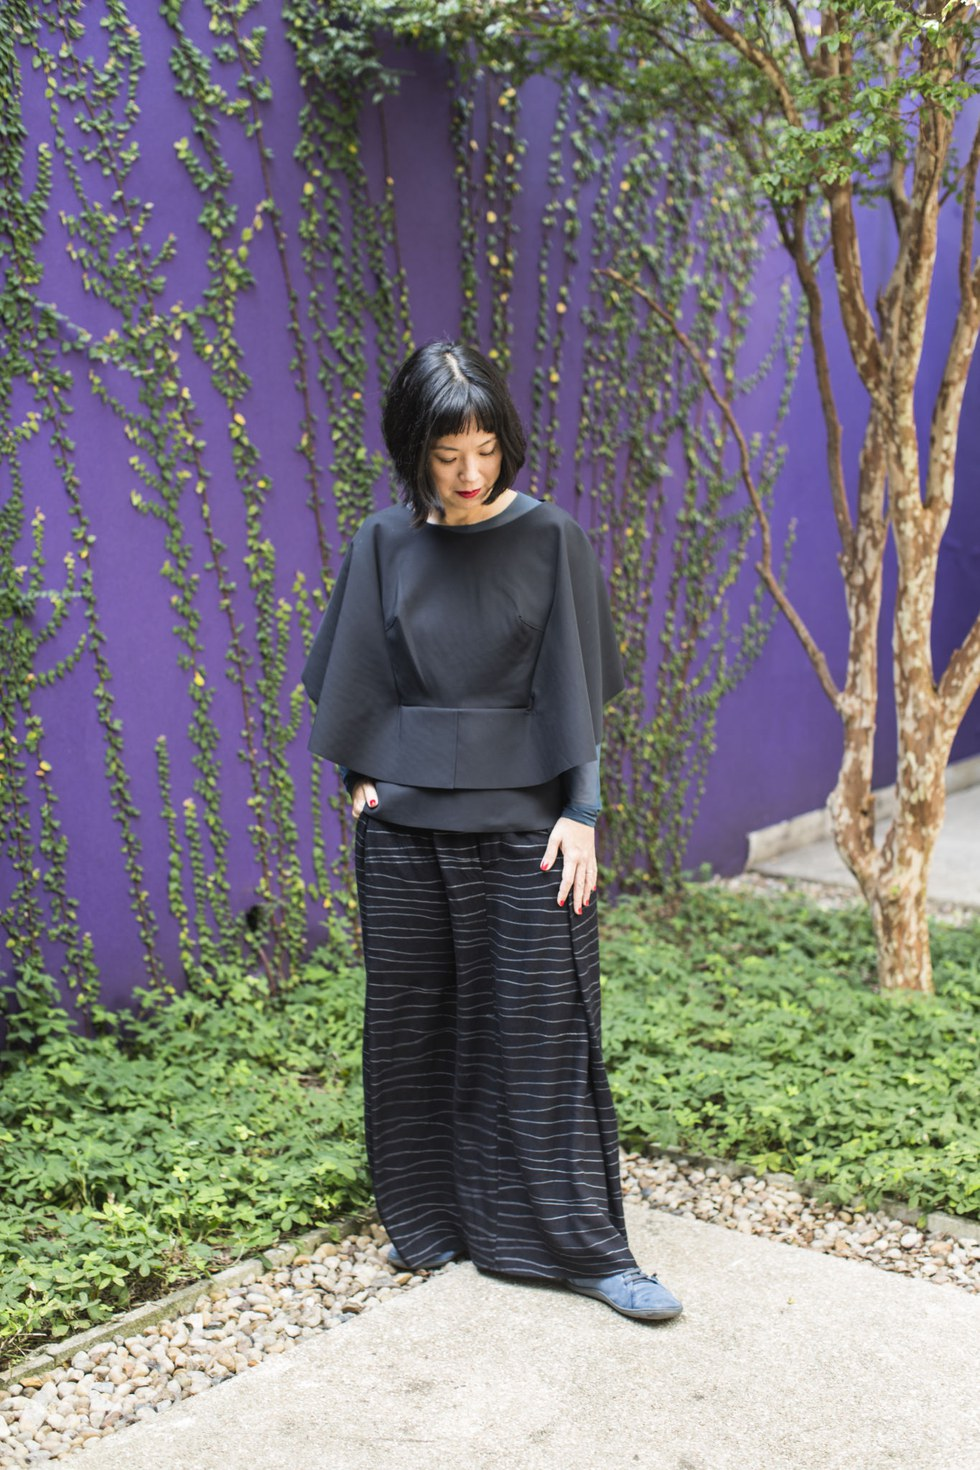 Fernanda Yamamoto, fashion designer